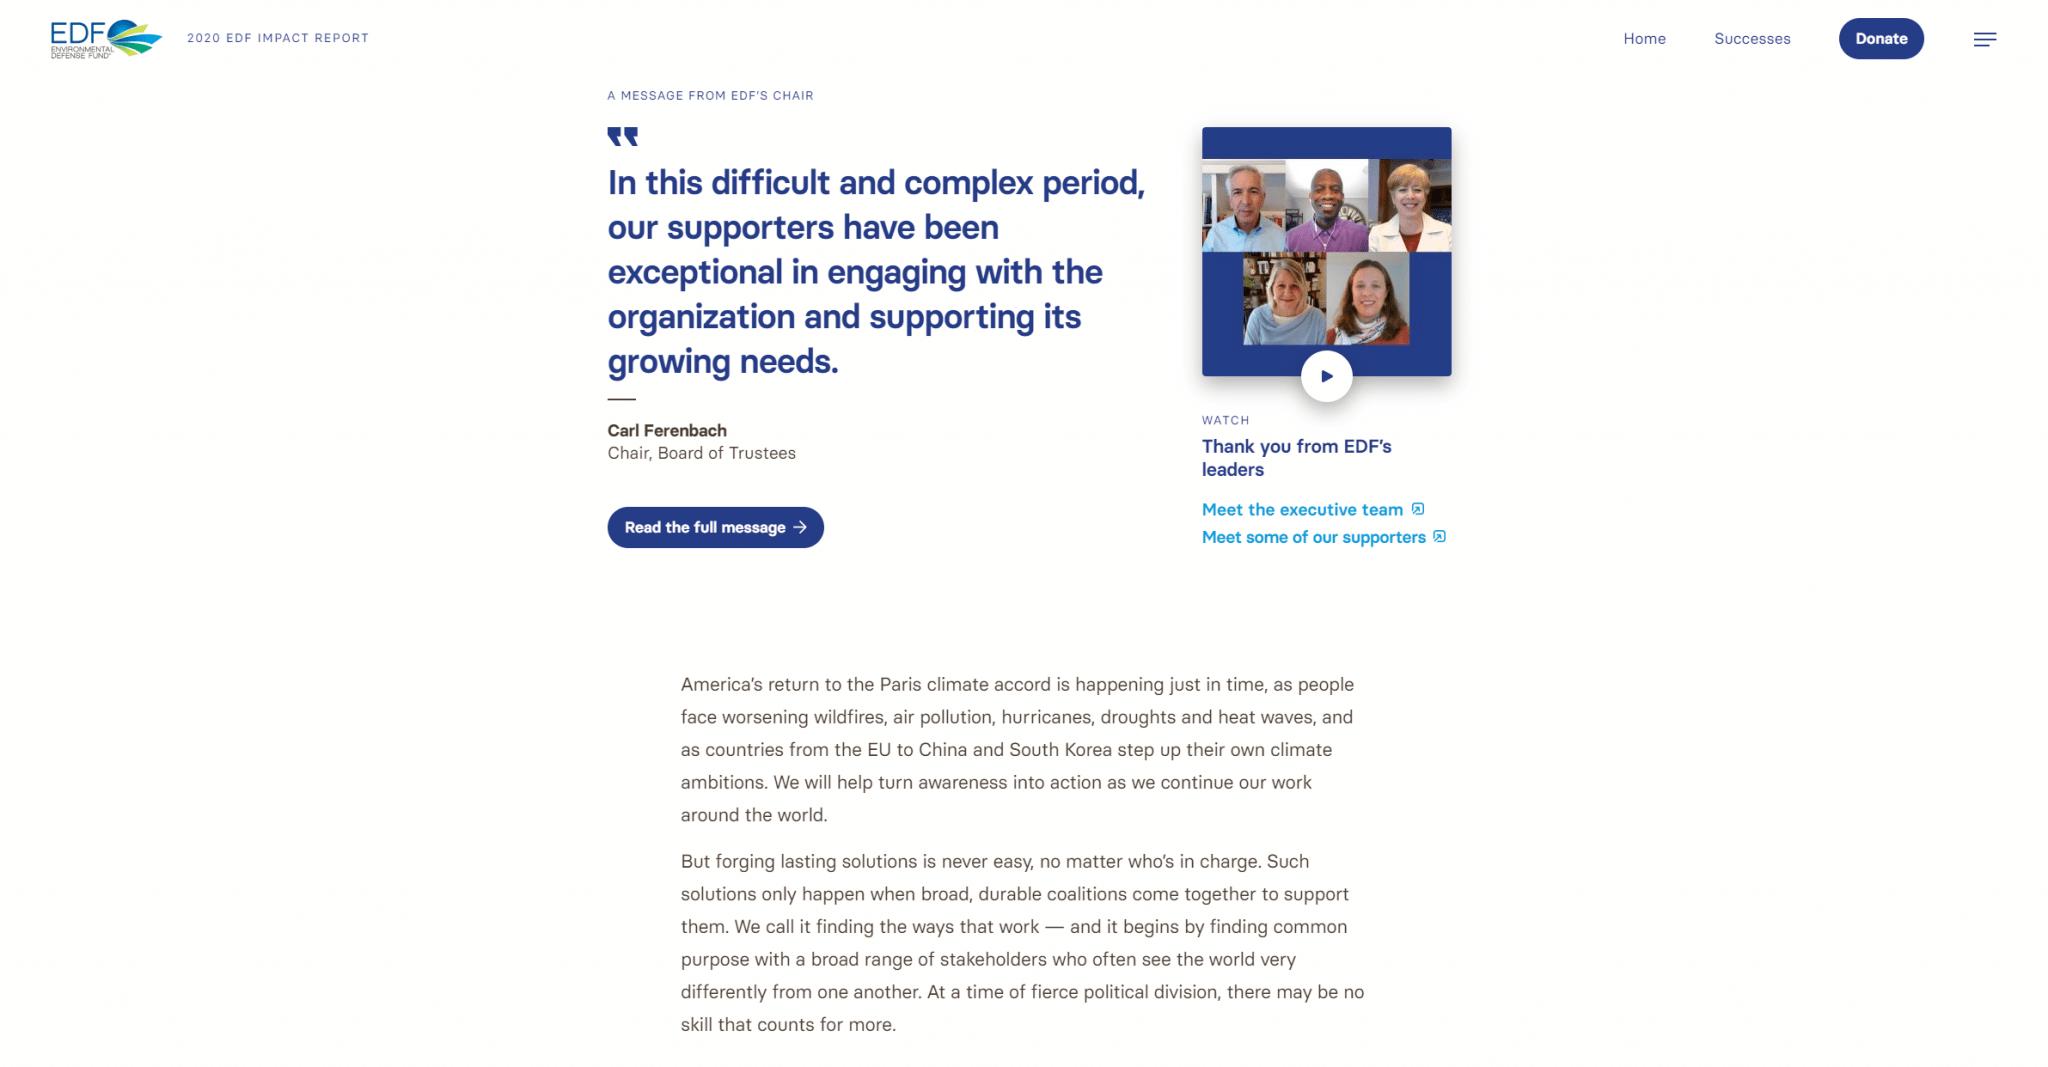 https___impact2020.edf.org_ Home – Environmental Defense Fund – 2020 Impact Report_003